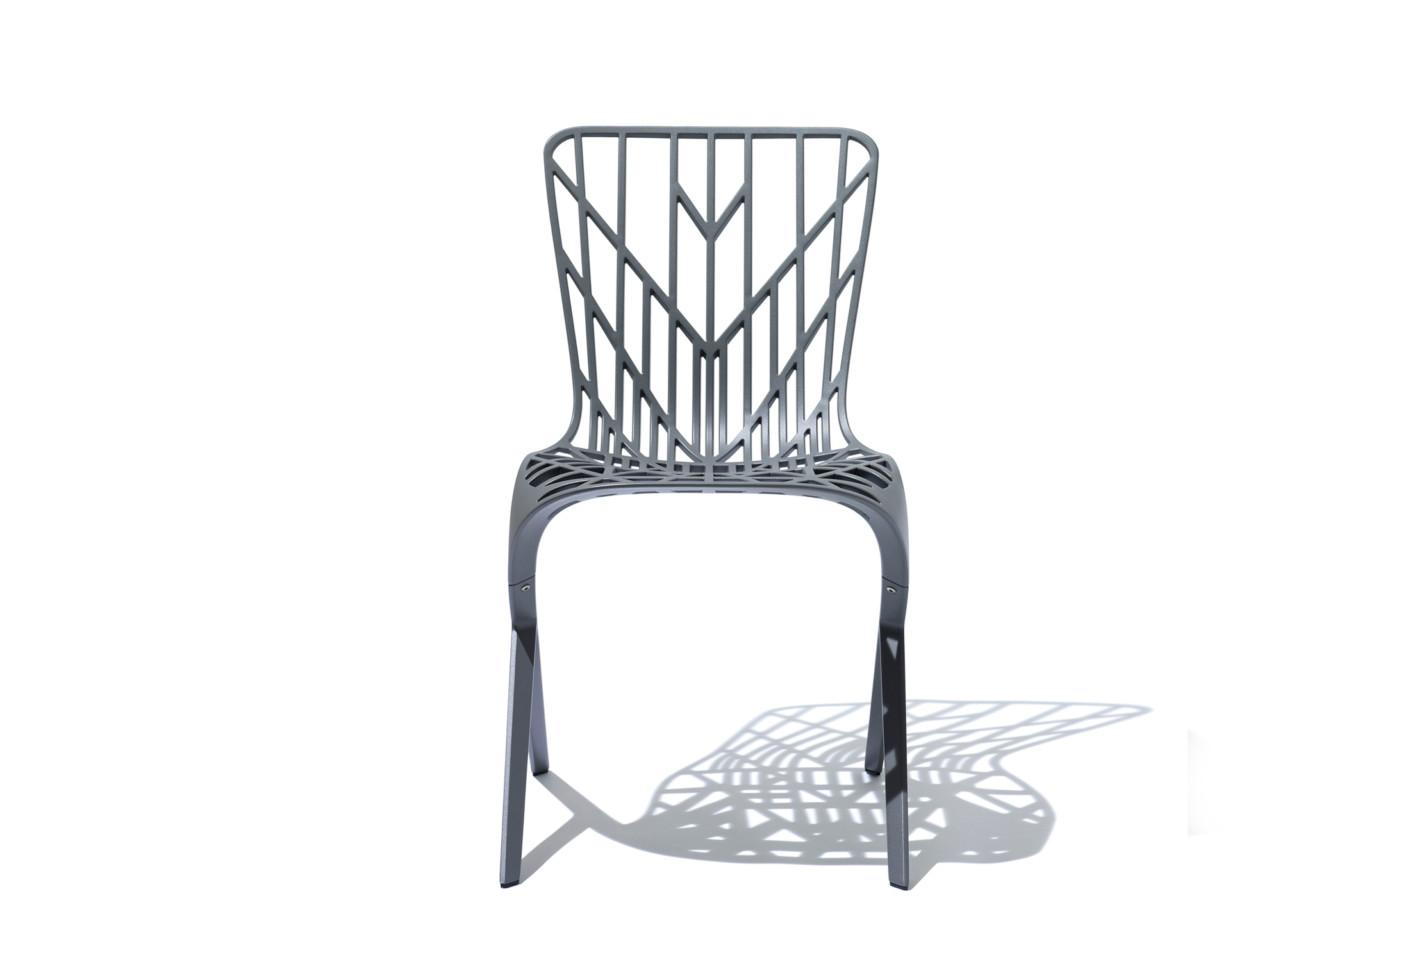 washington skeleton chair cover ideas for a wedding by knoll stylepark